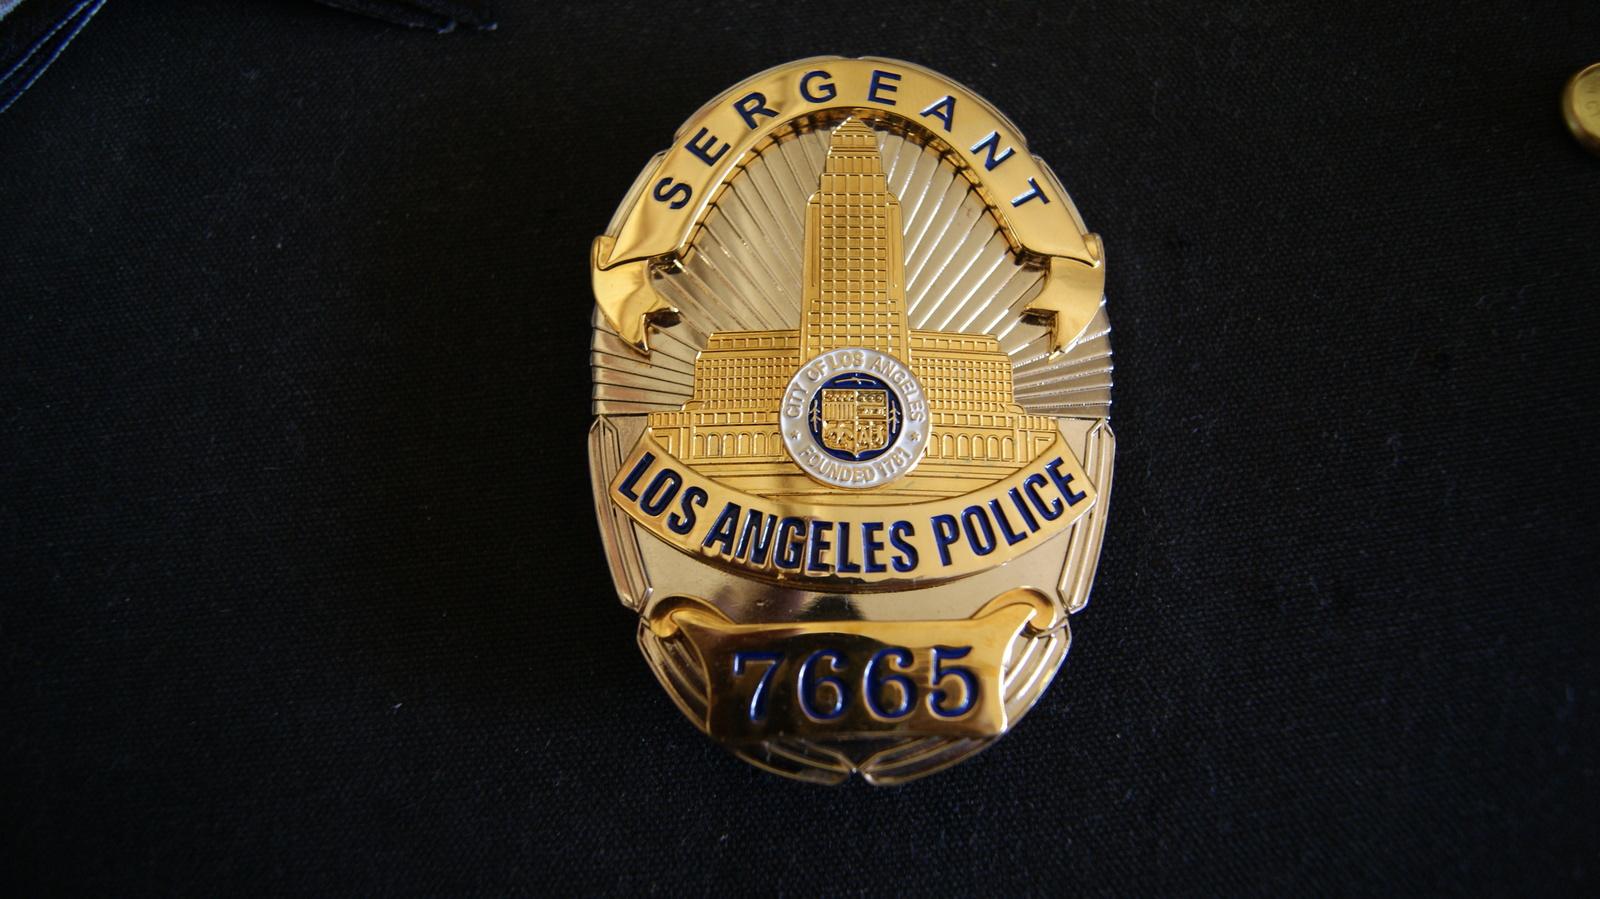 Los Angeles Police Badge,Sergeant Presentation Badge,Hmk Bellingham & Carrington